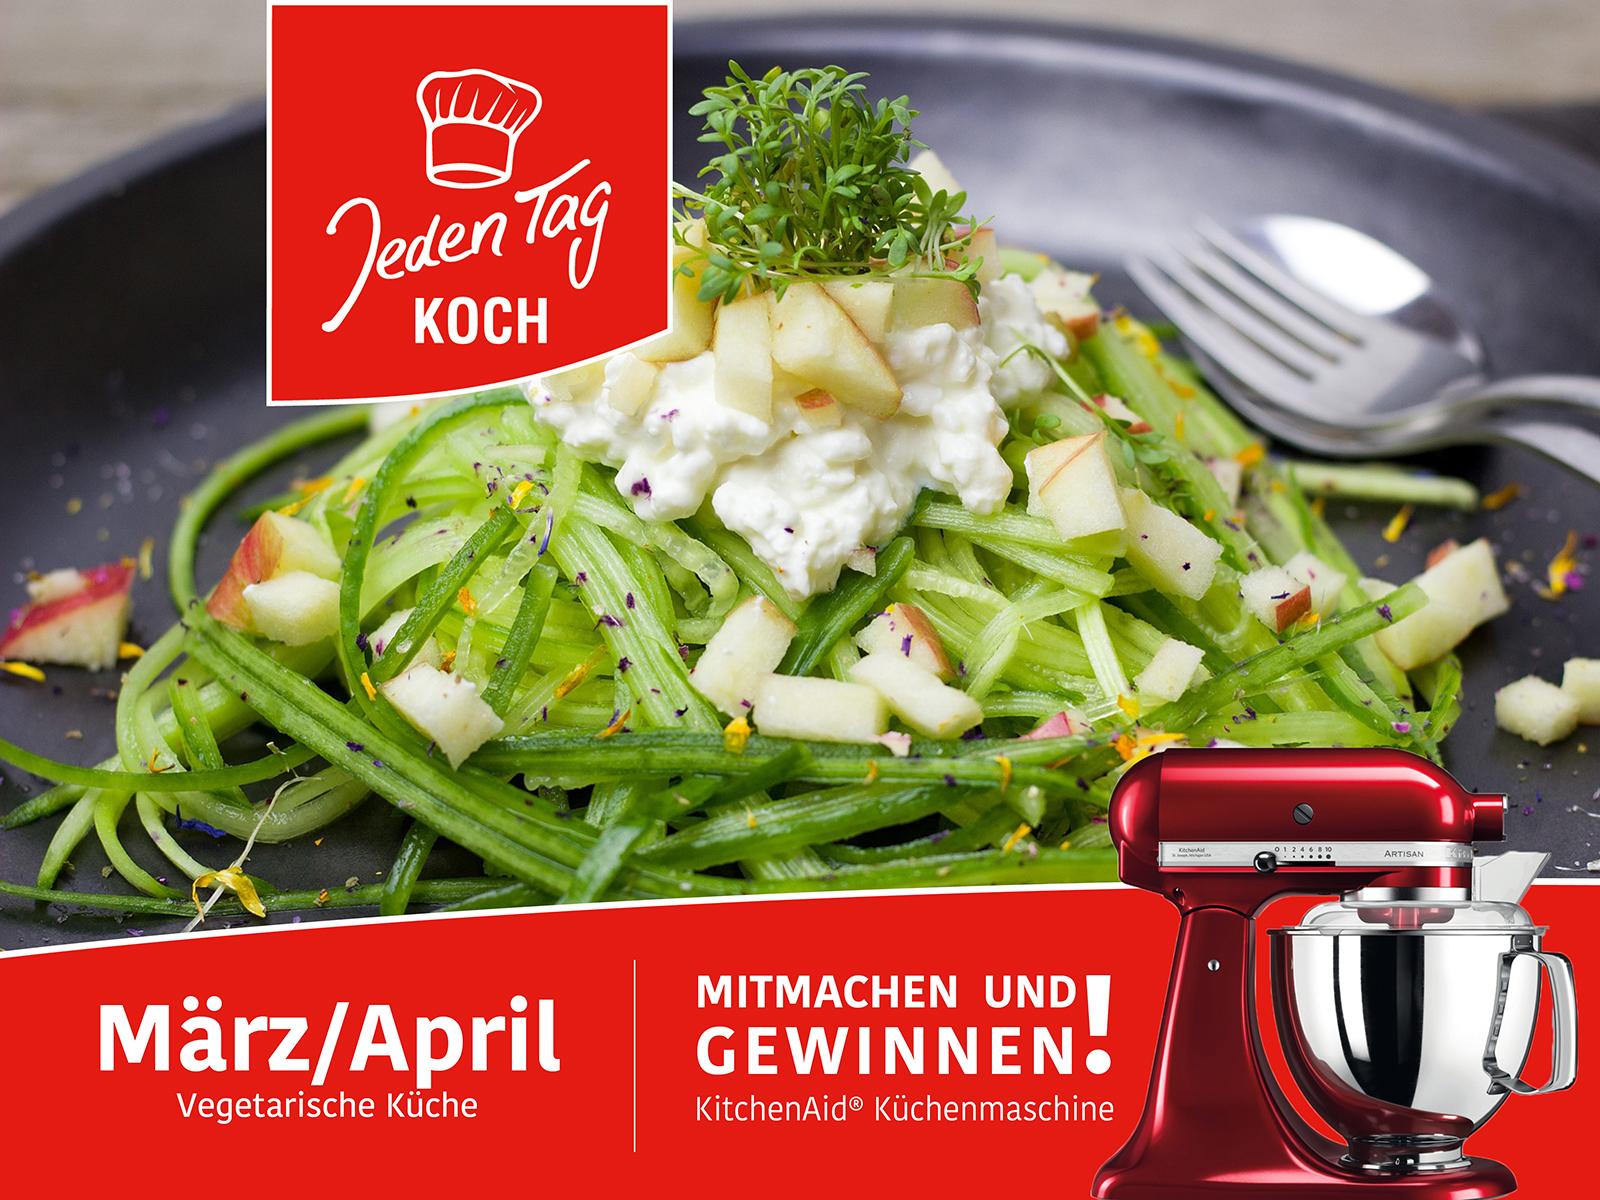 Jeden Tag Koch Gewinnspiel – März/April